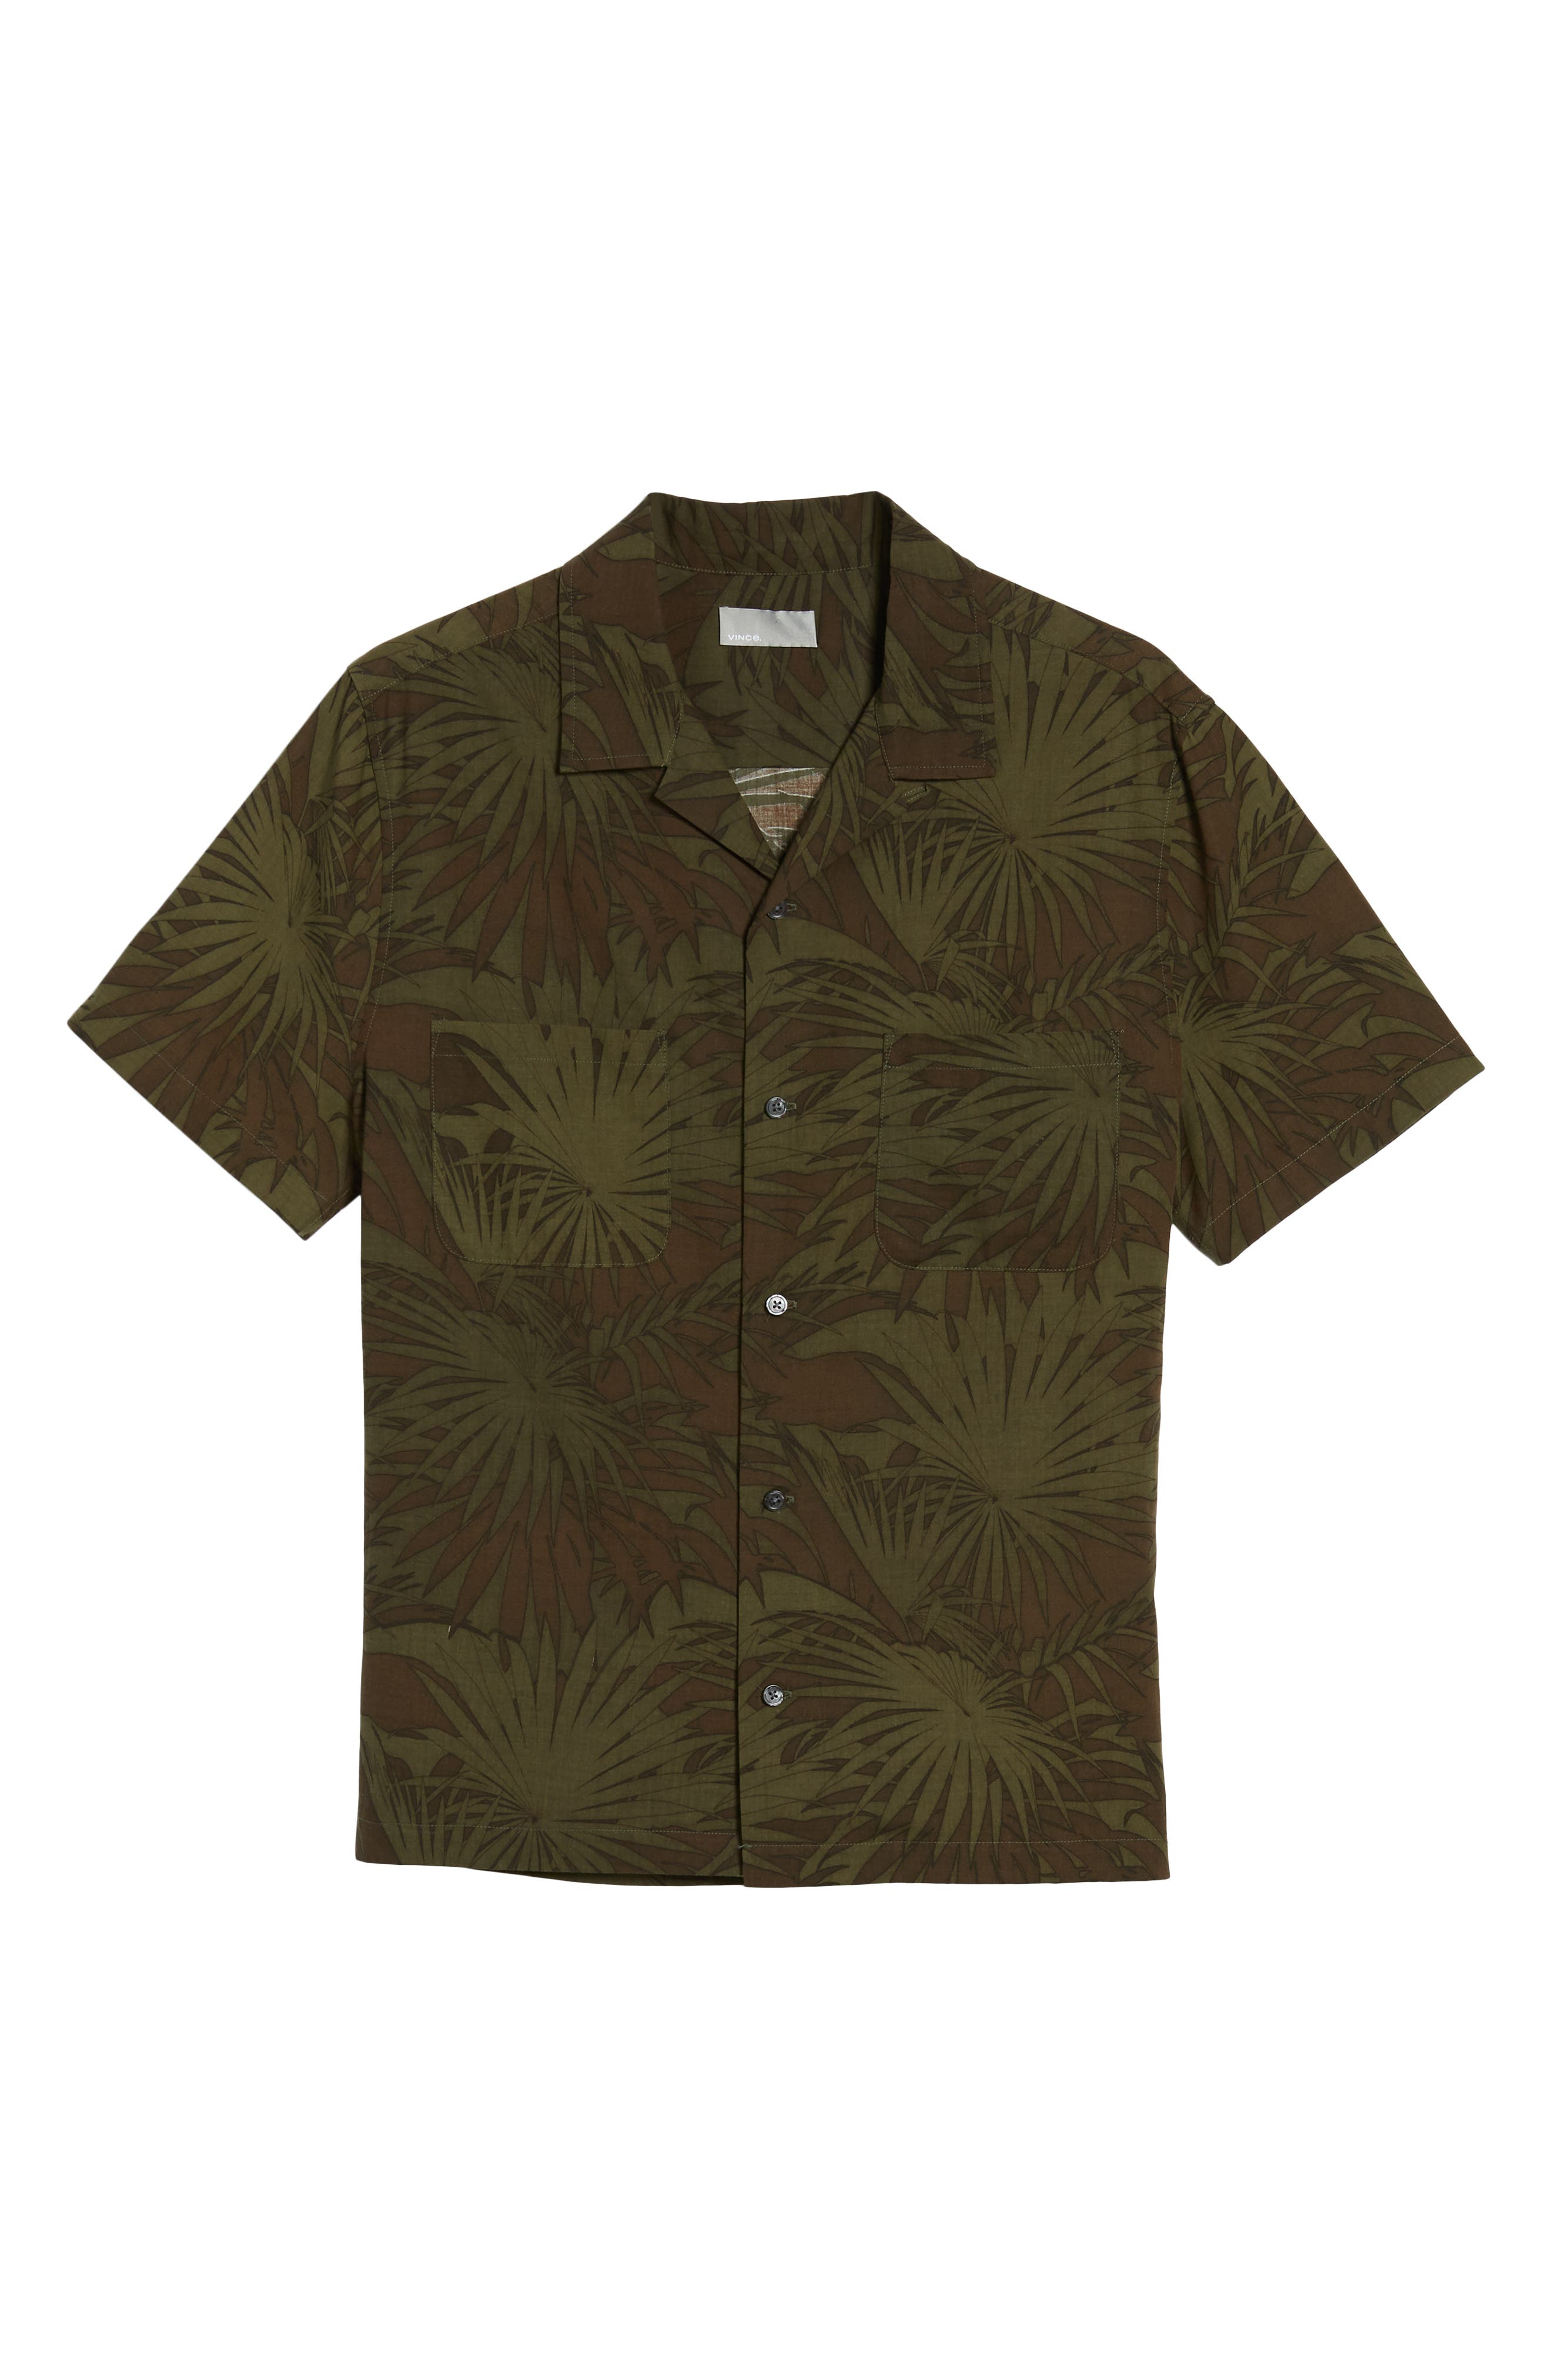 Palm Leaf Cabana Woven Shirt,                             Alternate thumbnail 6, color,                             FOLIAGE/ DRIED HERB